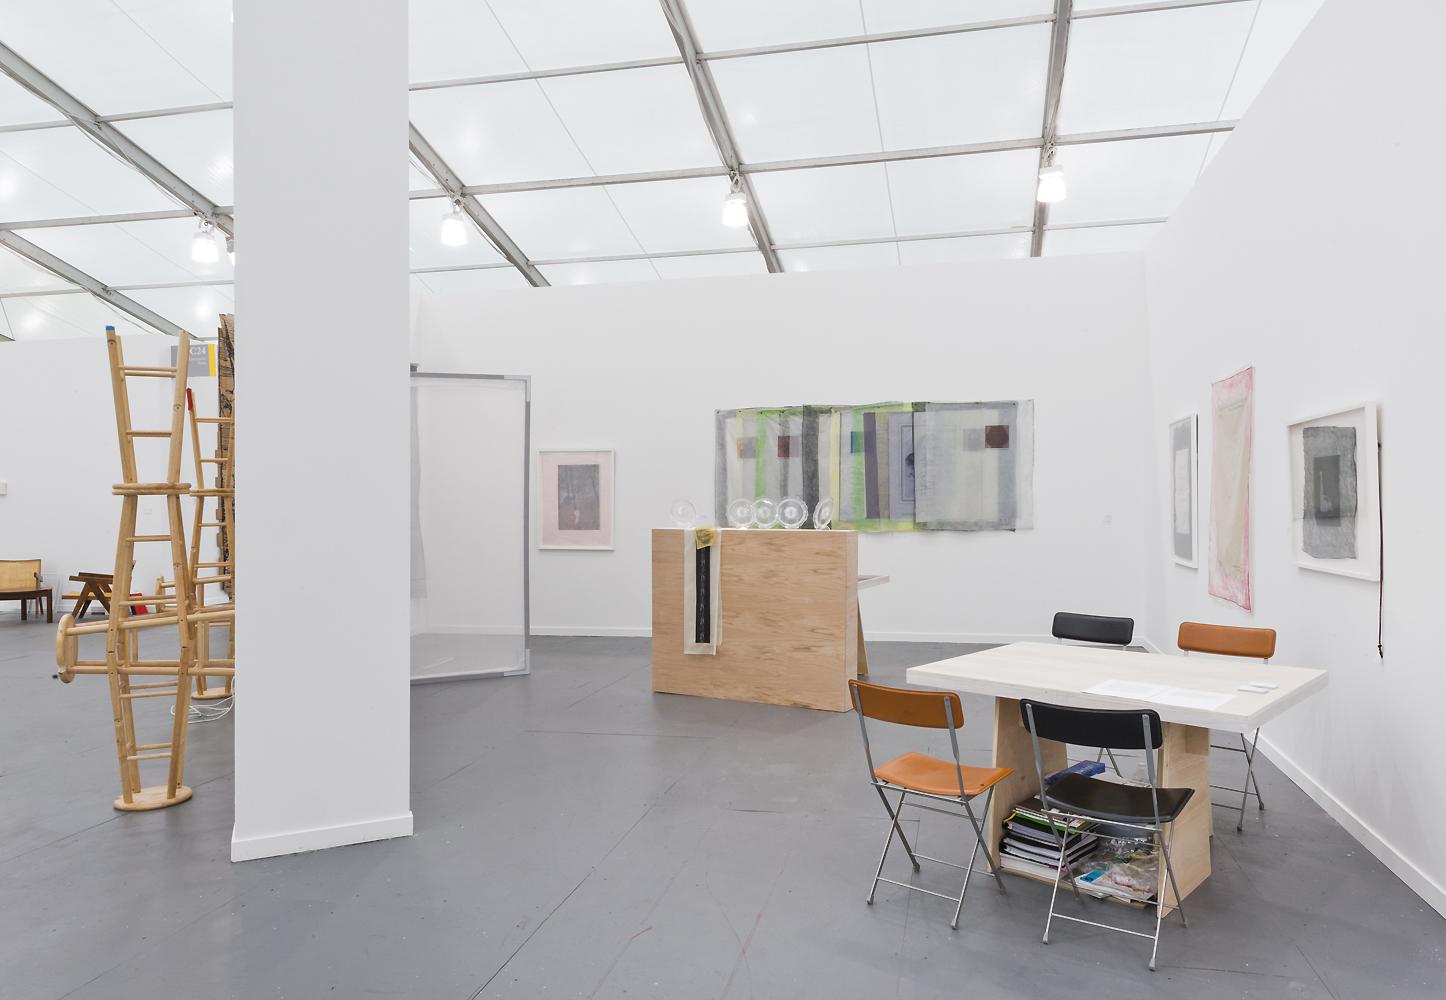 Valerie Snobeck & Catherine Sullivan,  Limited Good 3 ,Galerie Catherine Bastide, Frieze New York, 2013, installation view